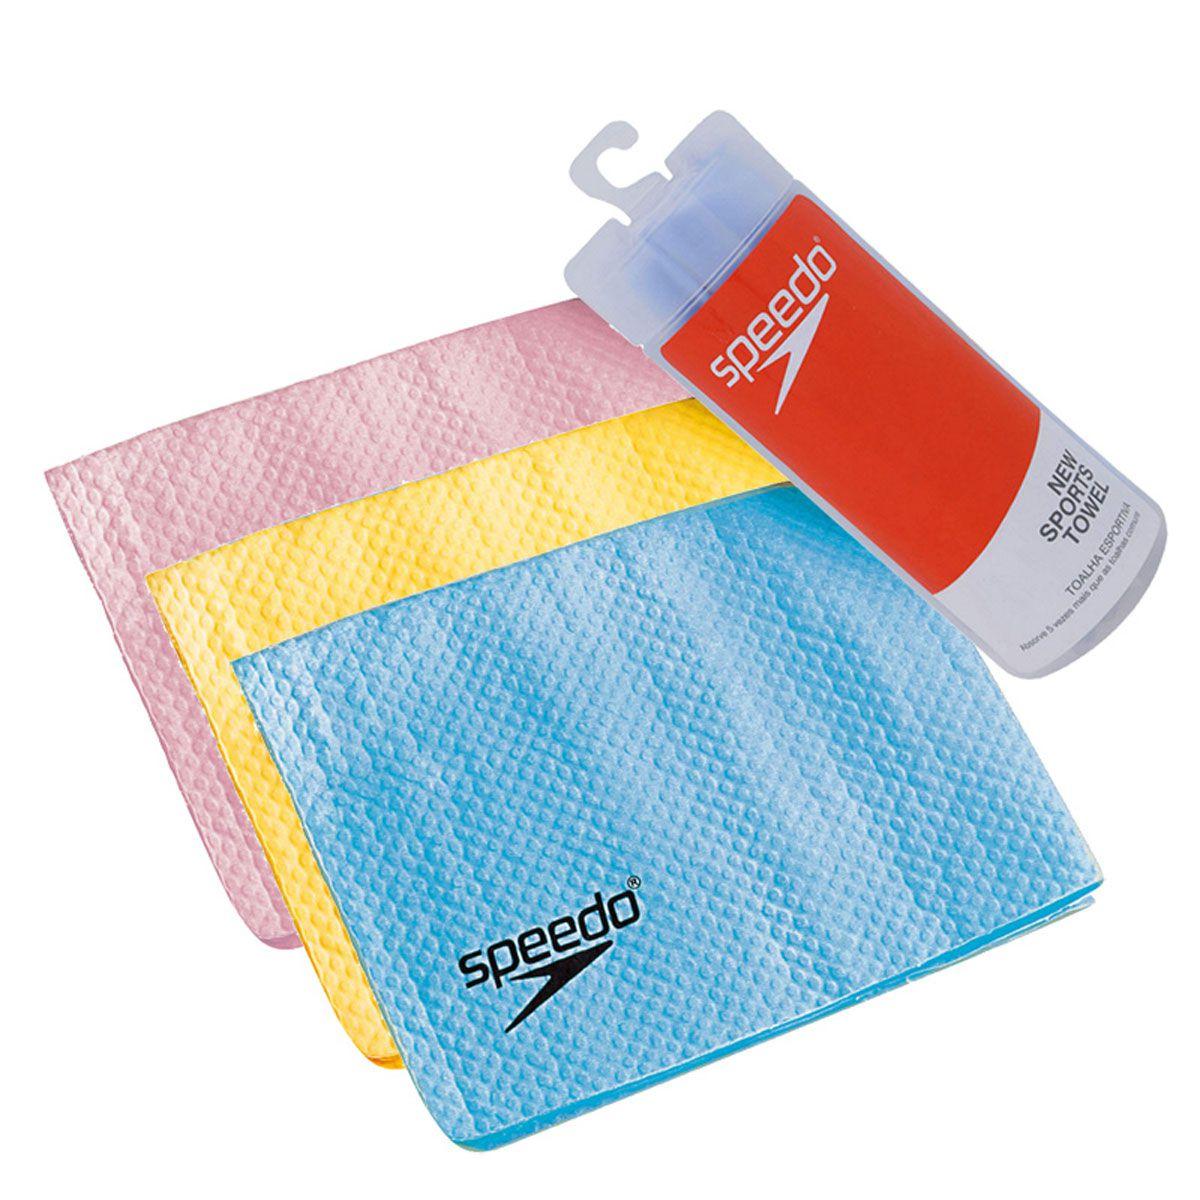 Toalha Speedo Esportiva New Sports Towel - 629048